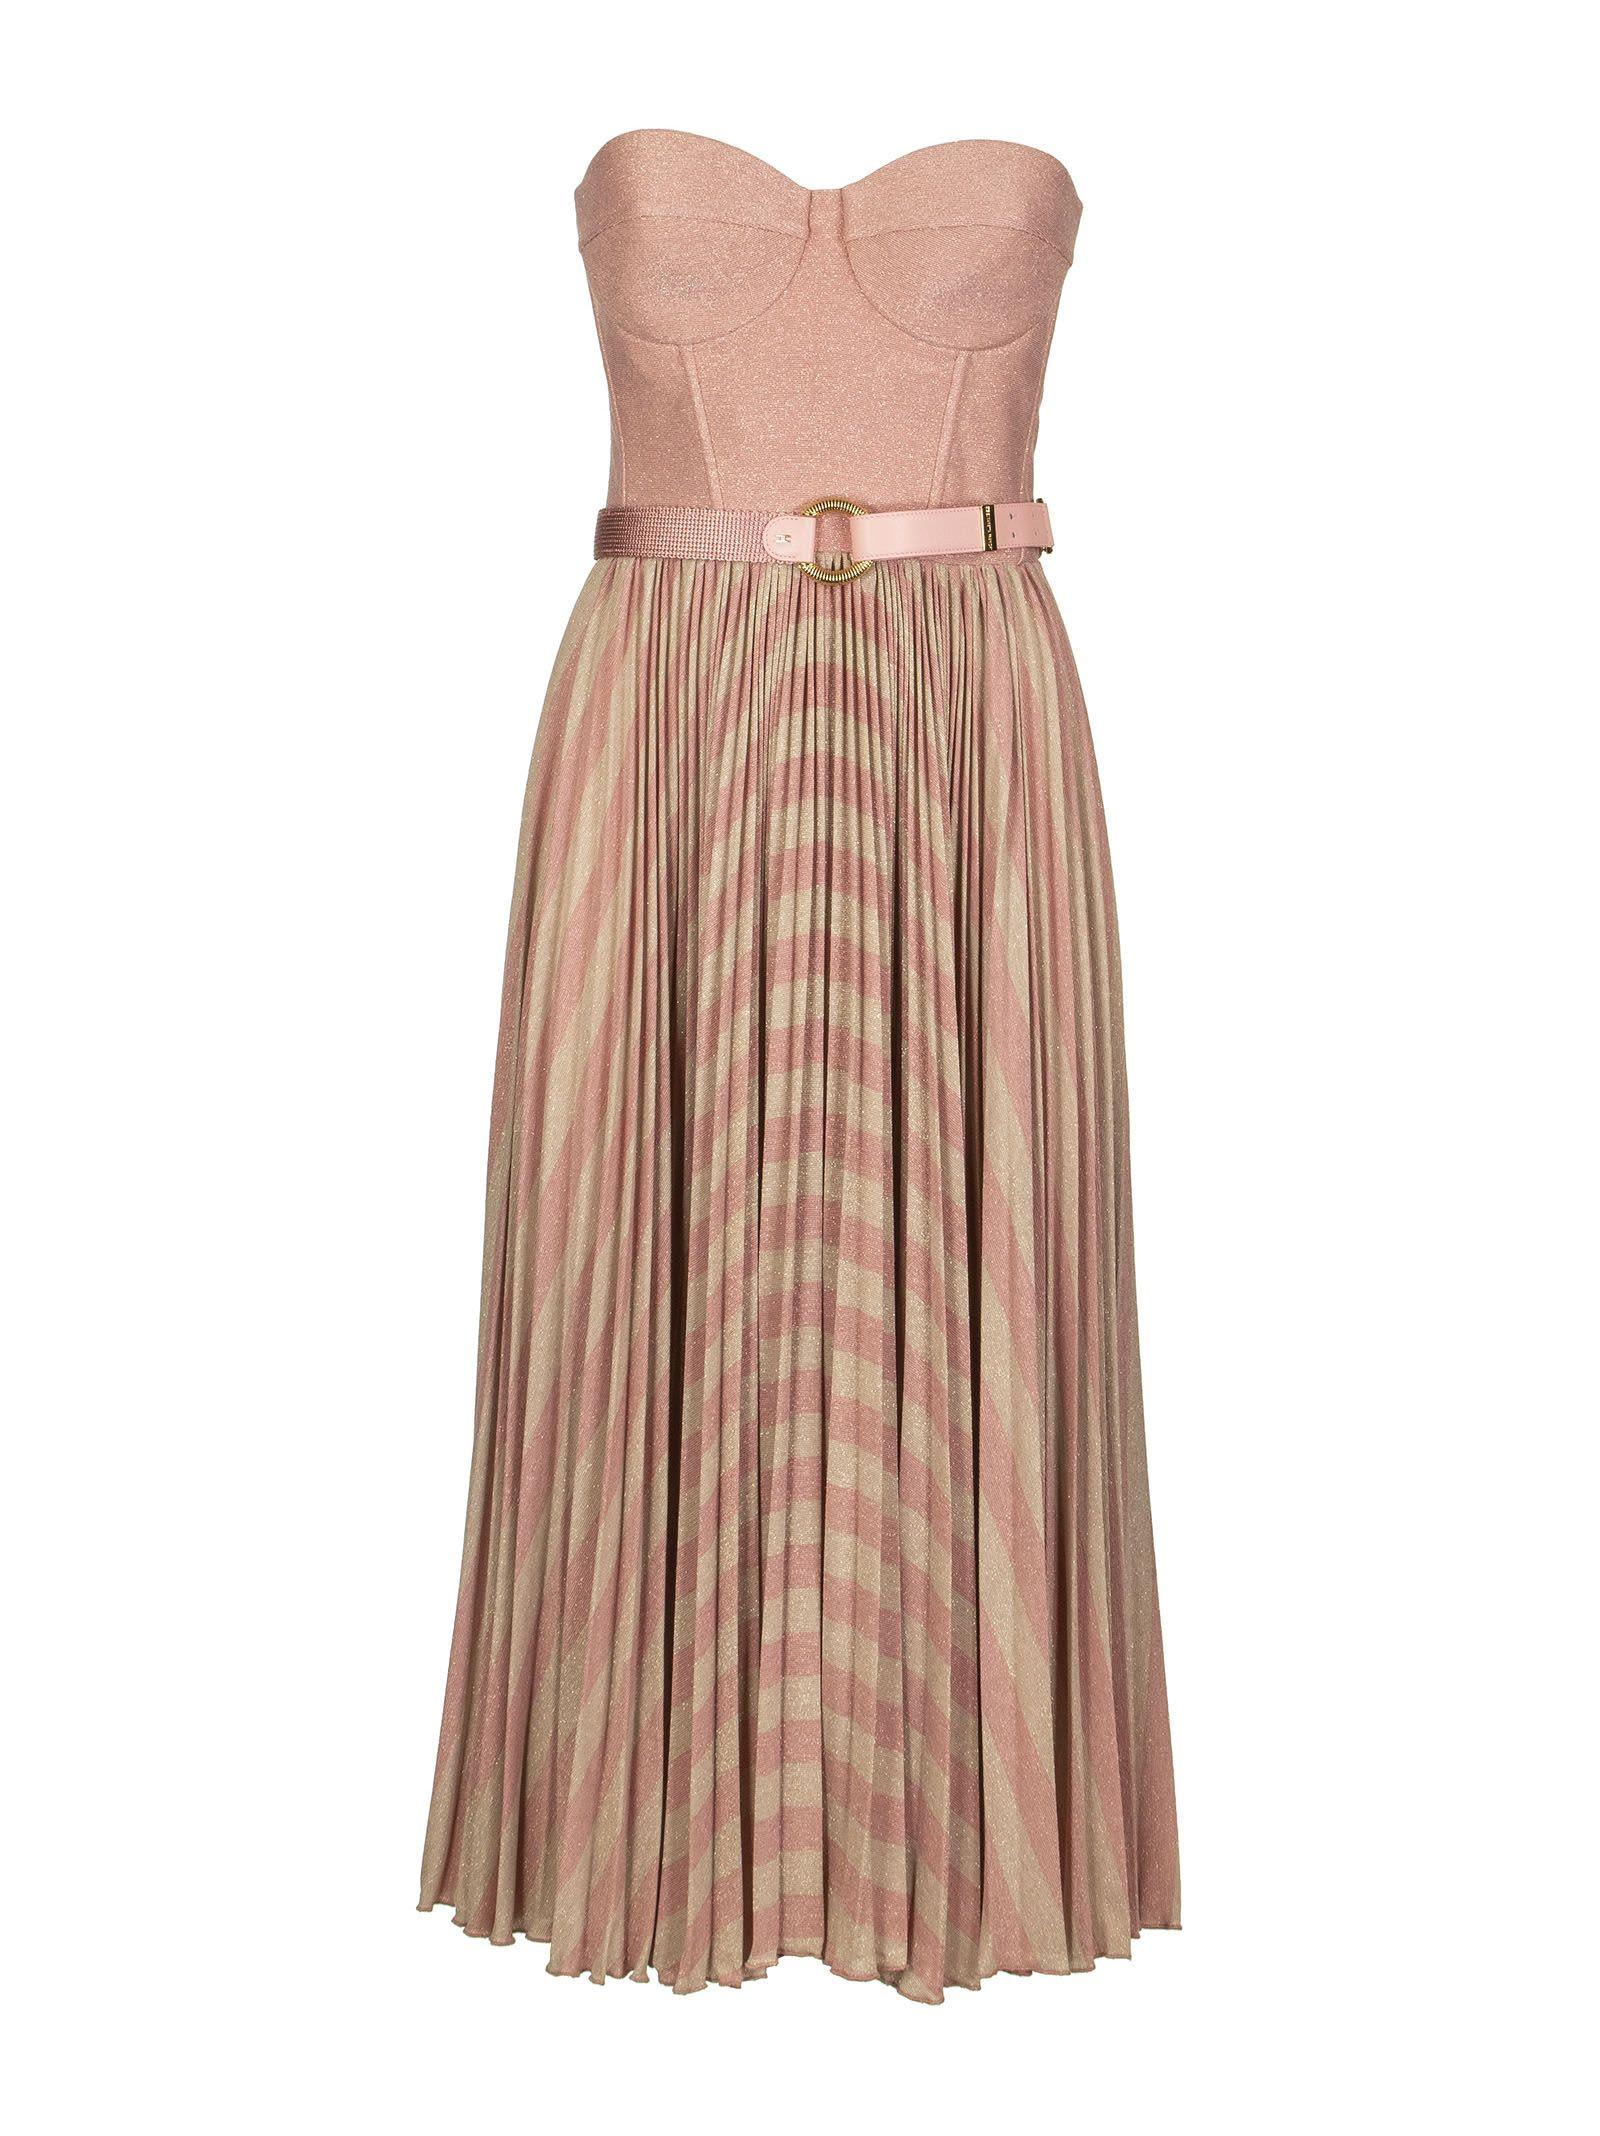 Buy Elisabetta Franchi Celyn B. Sleeveless Dress With Belt online, shop Elisabetta Franchi Celyn B. with free shipping